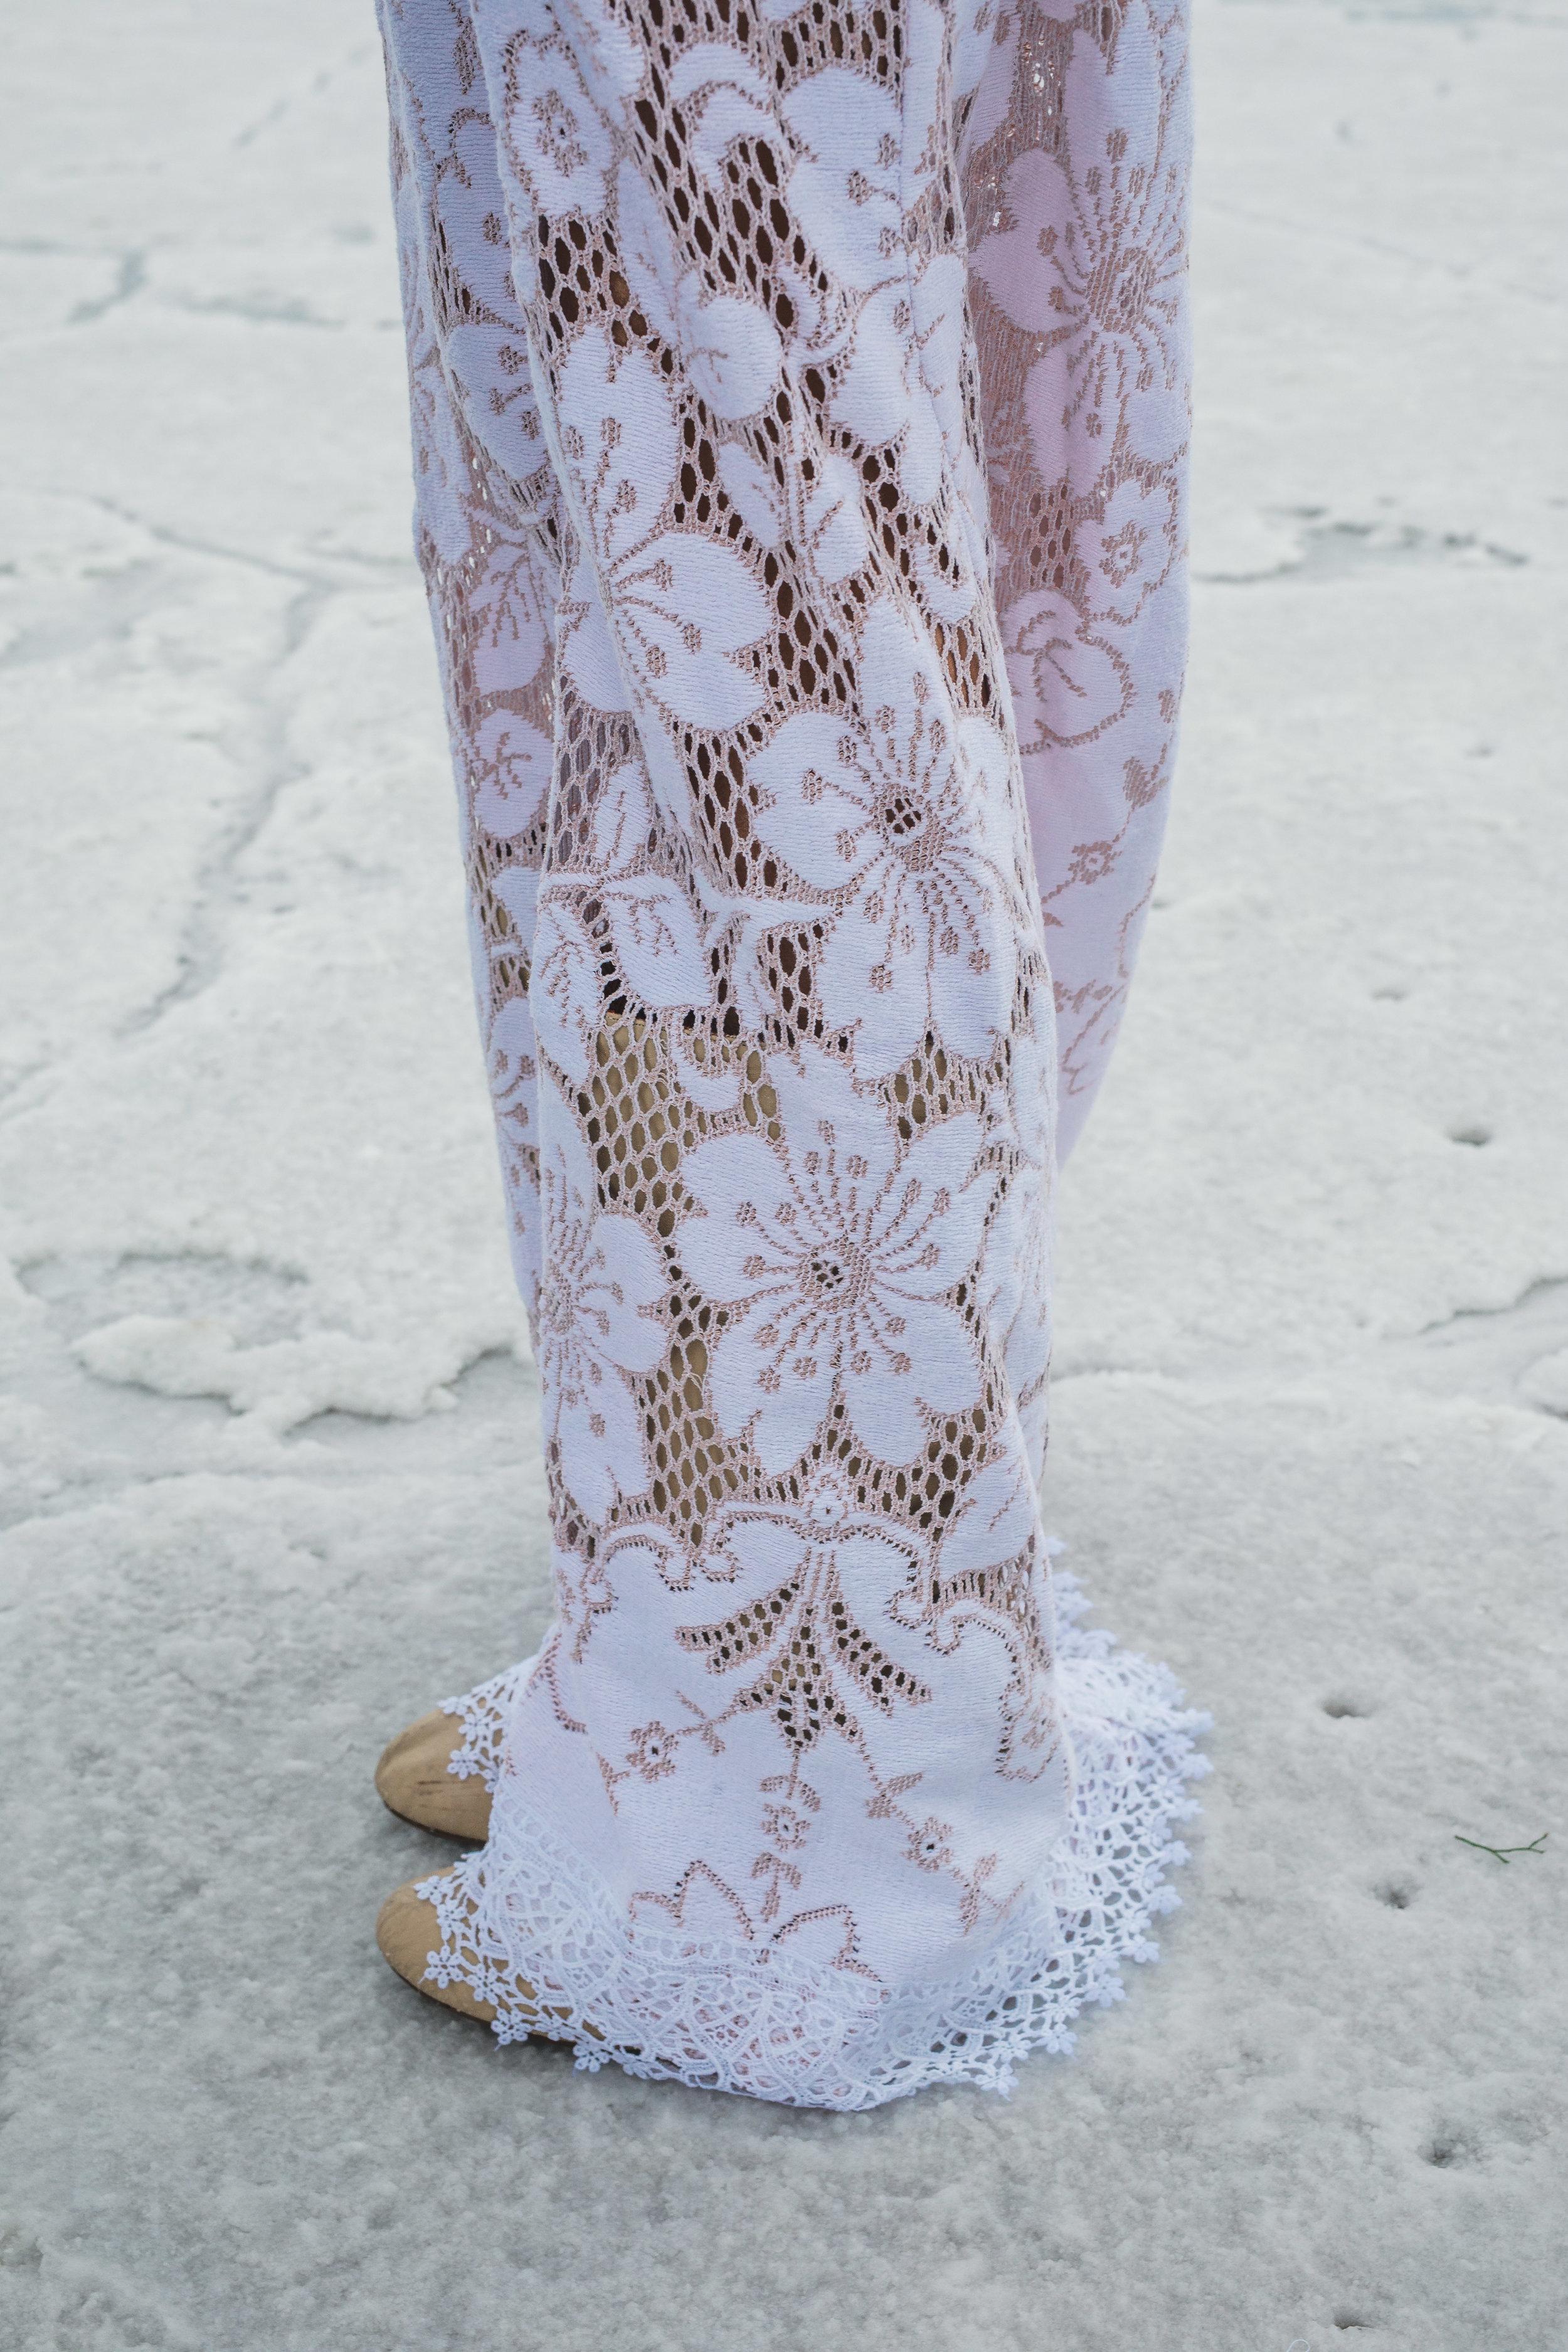 Saldana Vintage unlined rose dress detail Bonneville Salt Flats